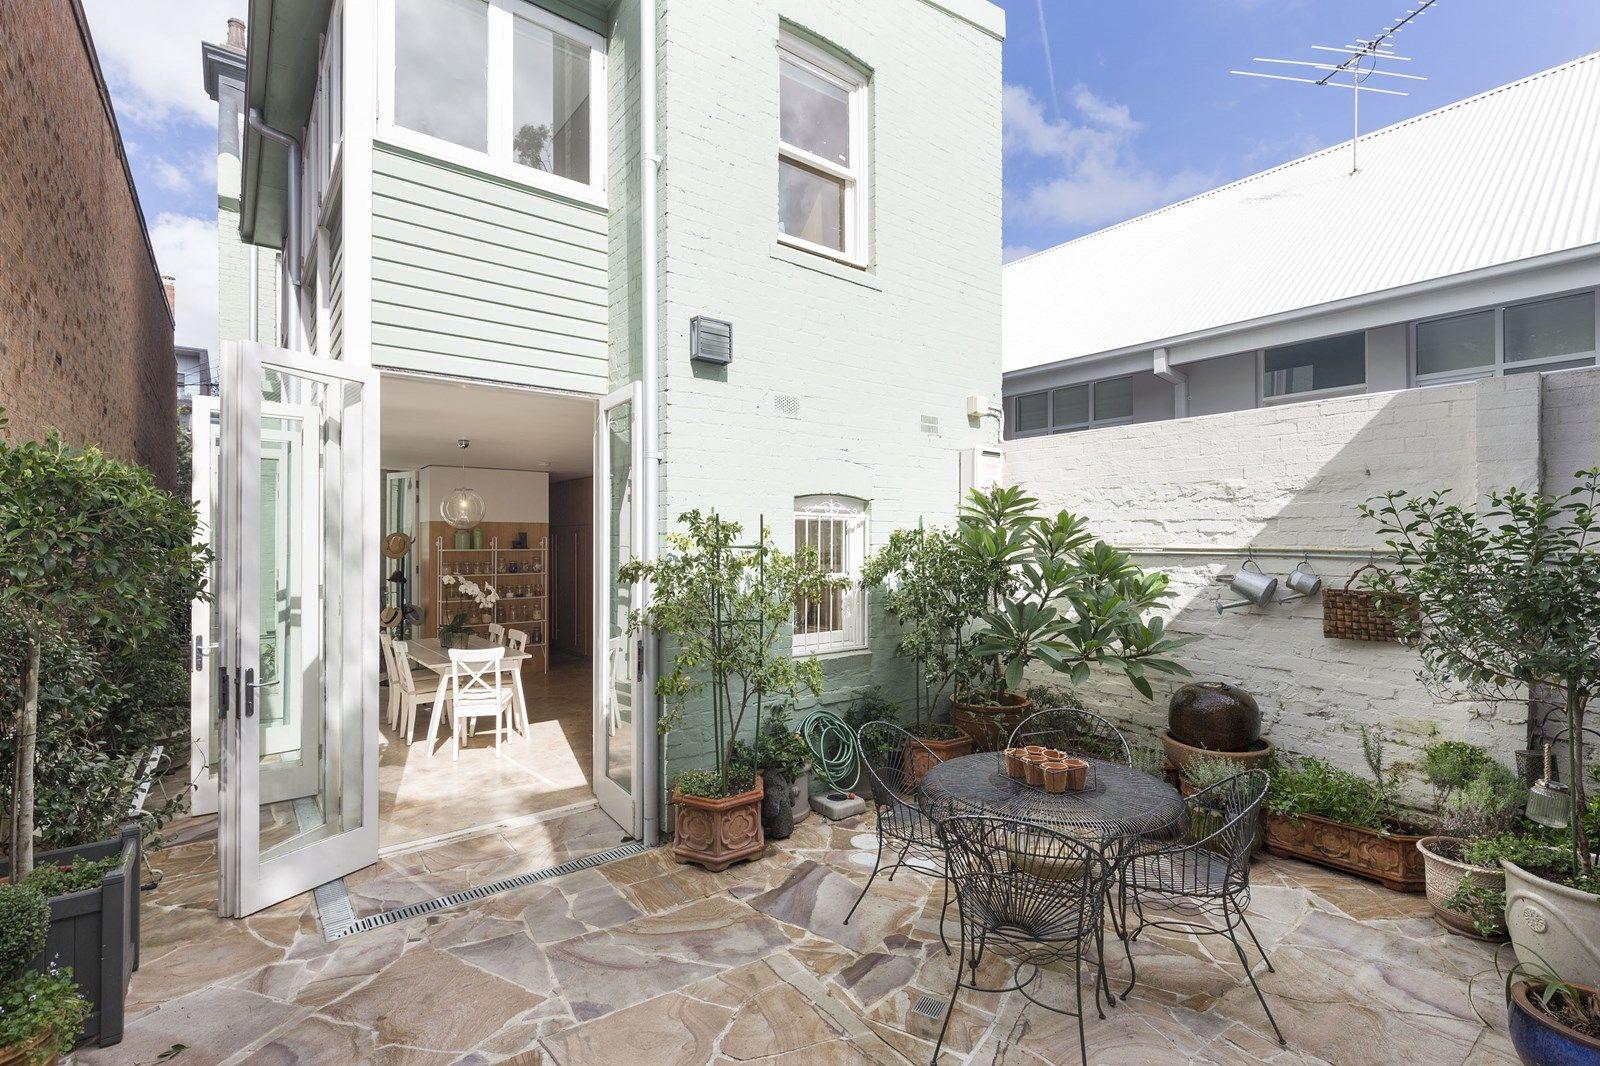 6 bedroom house for sale at 258 Wilson Street, Darlington